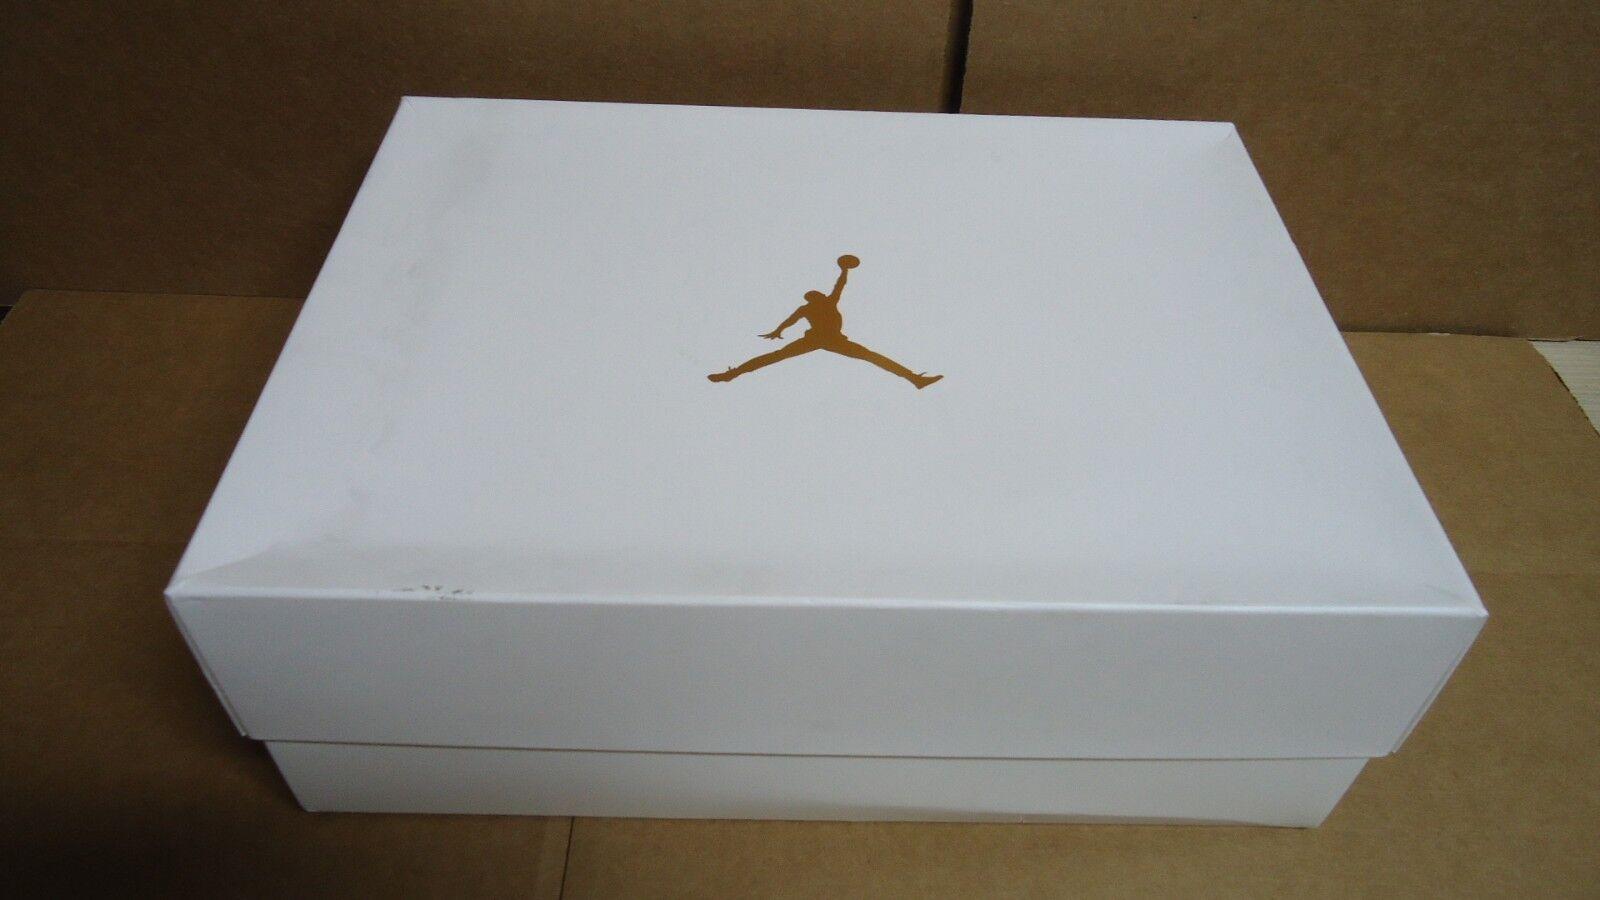 New Air Jordan 10 Retro OVO Drake Size 12 Summit White Metallic gold shoes